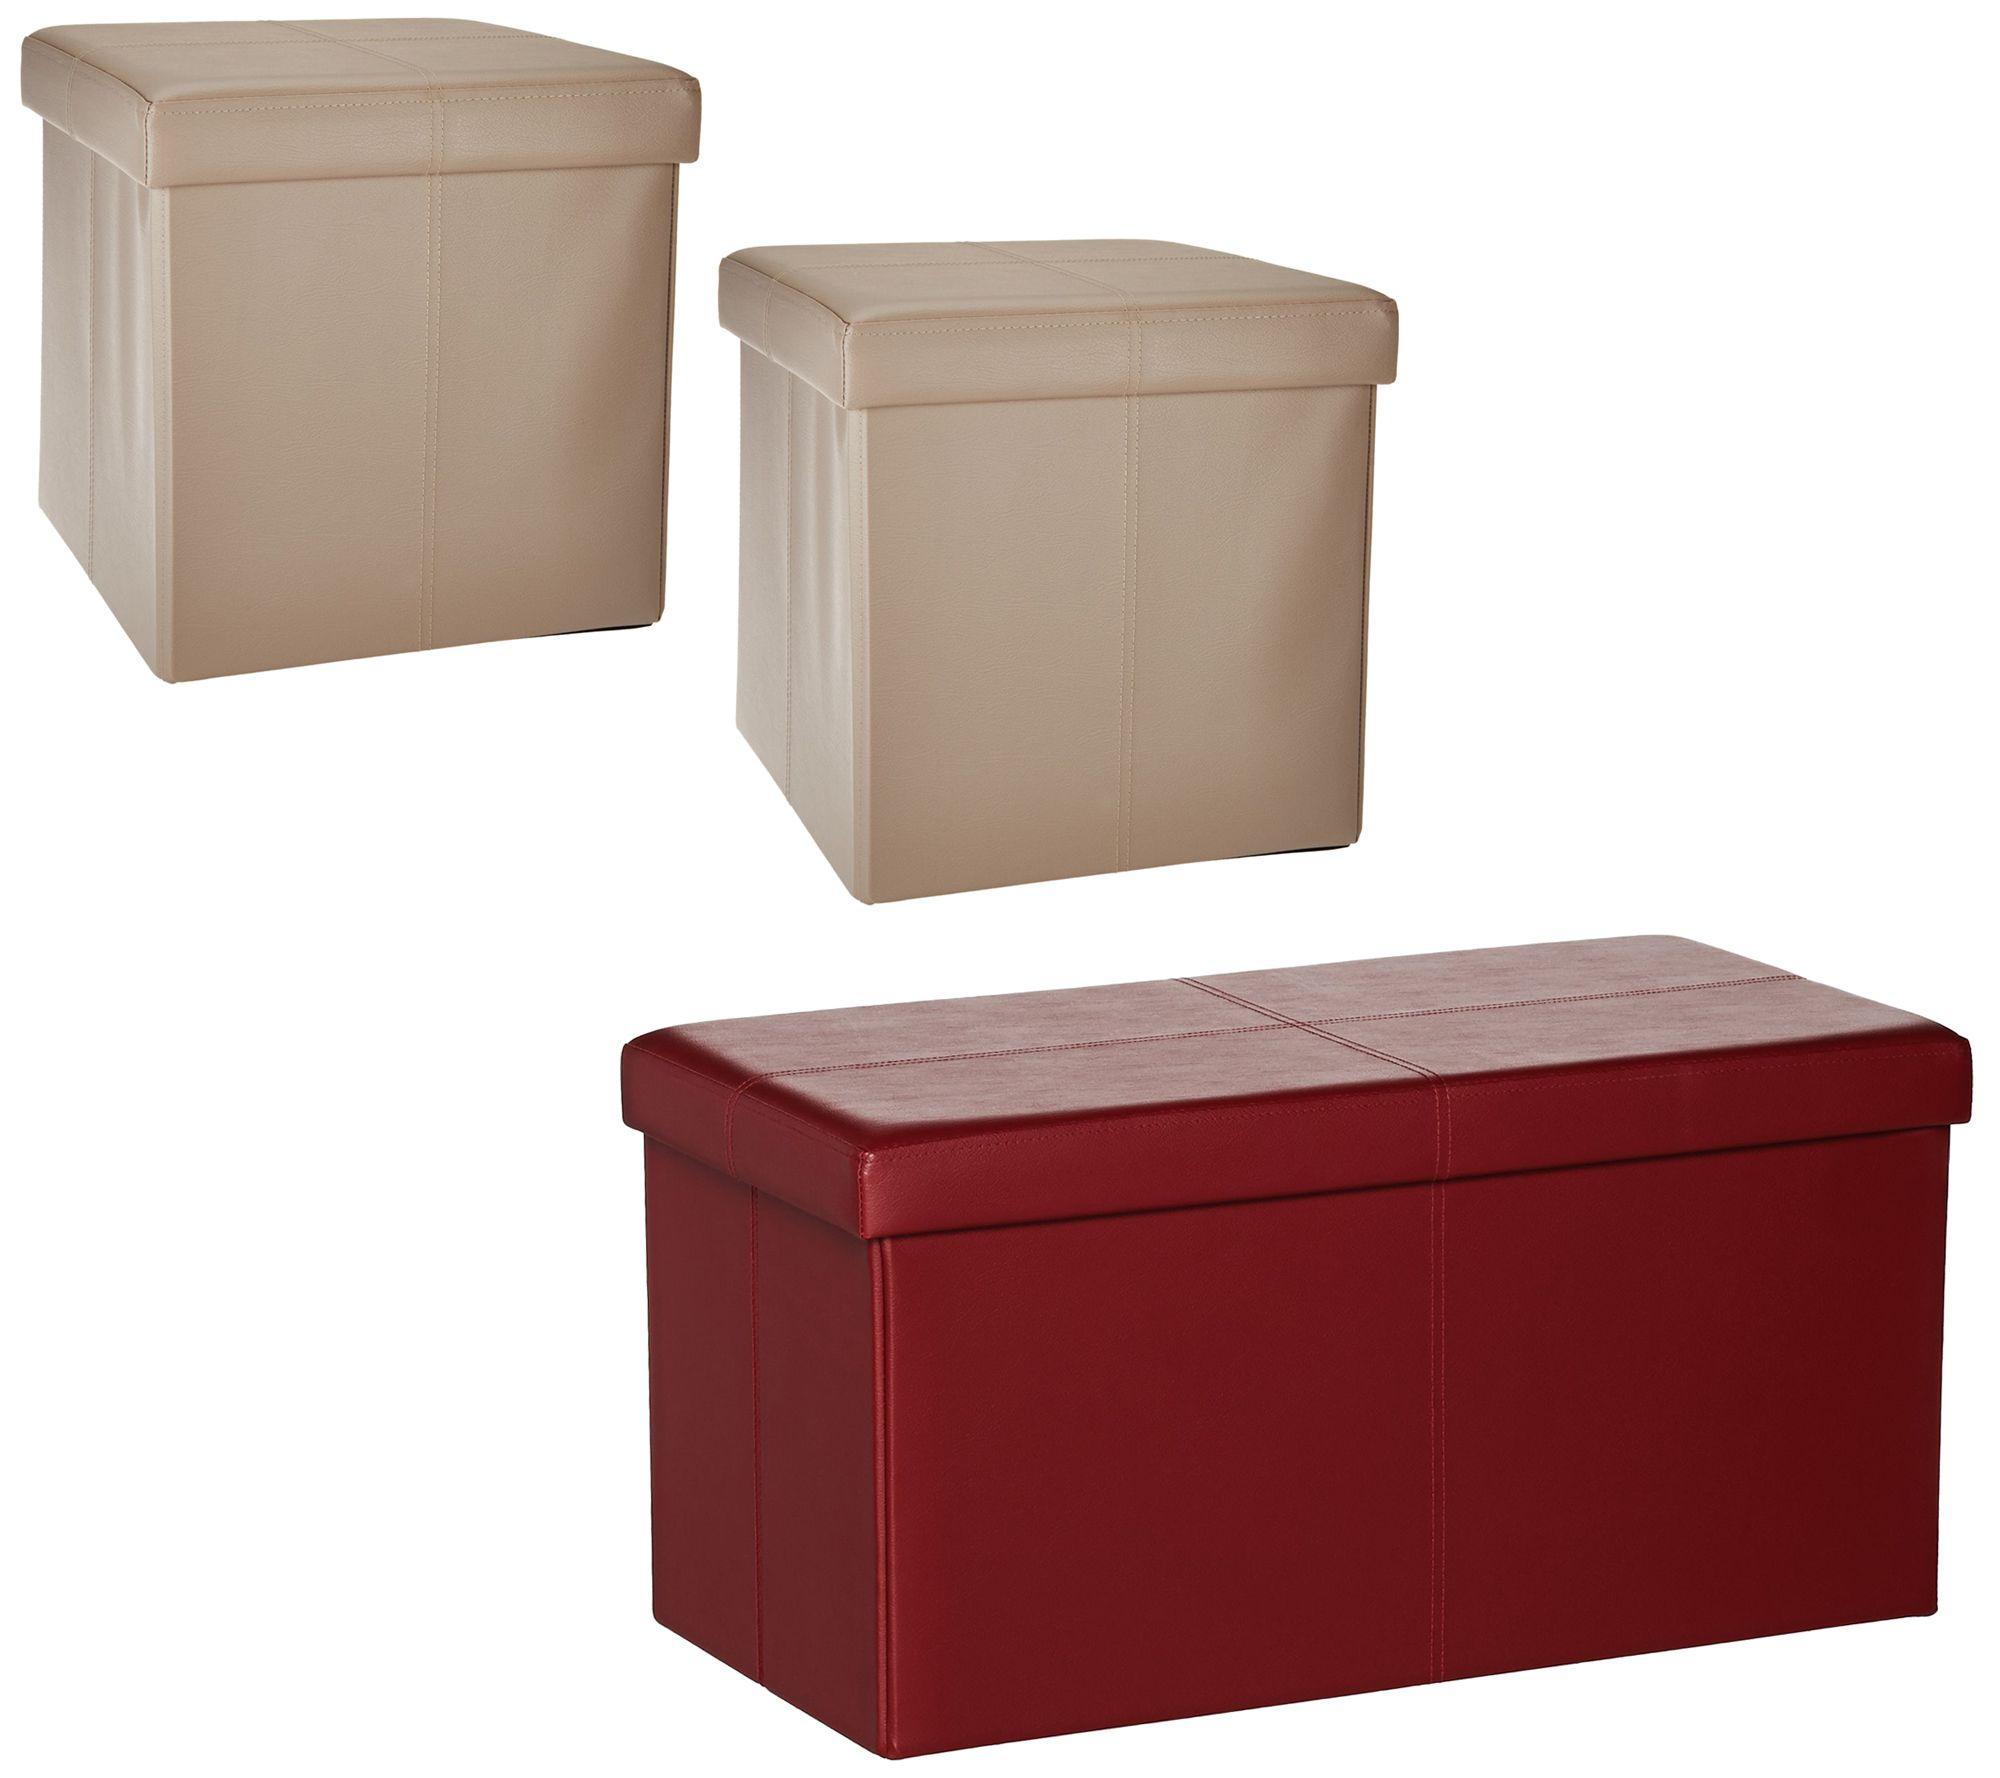 Faux Leather Folding 2 pc Ottoman Set or Storage Bench by FHE QVCcom